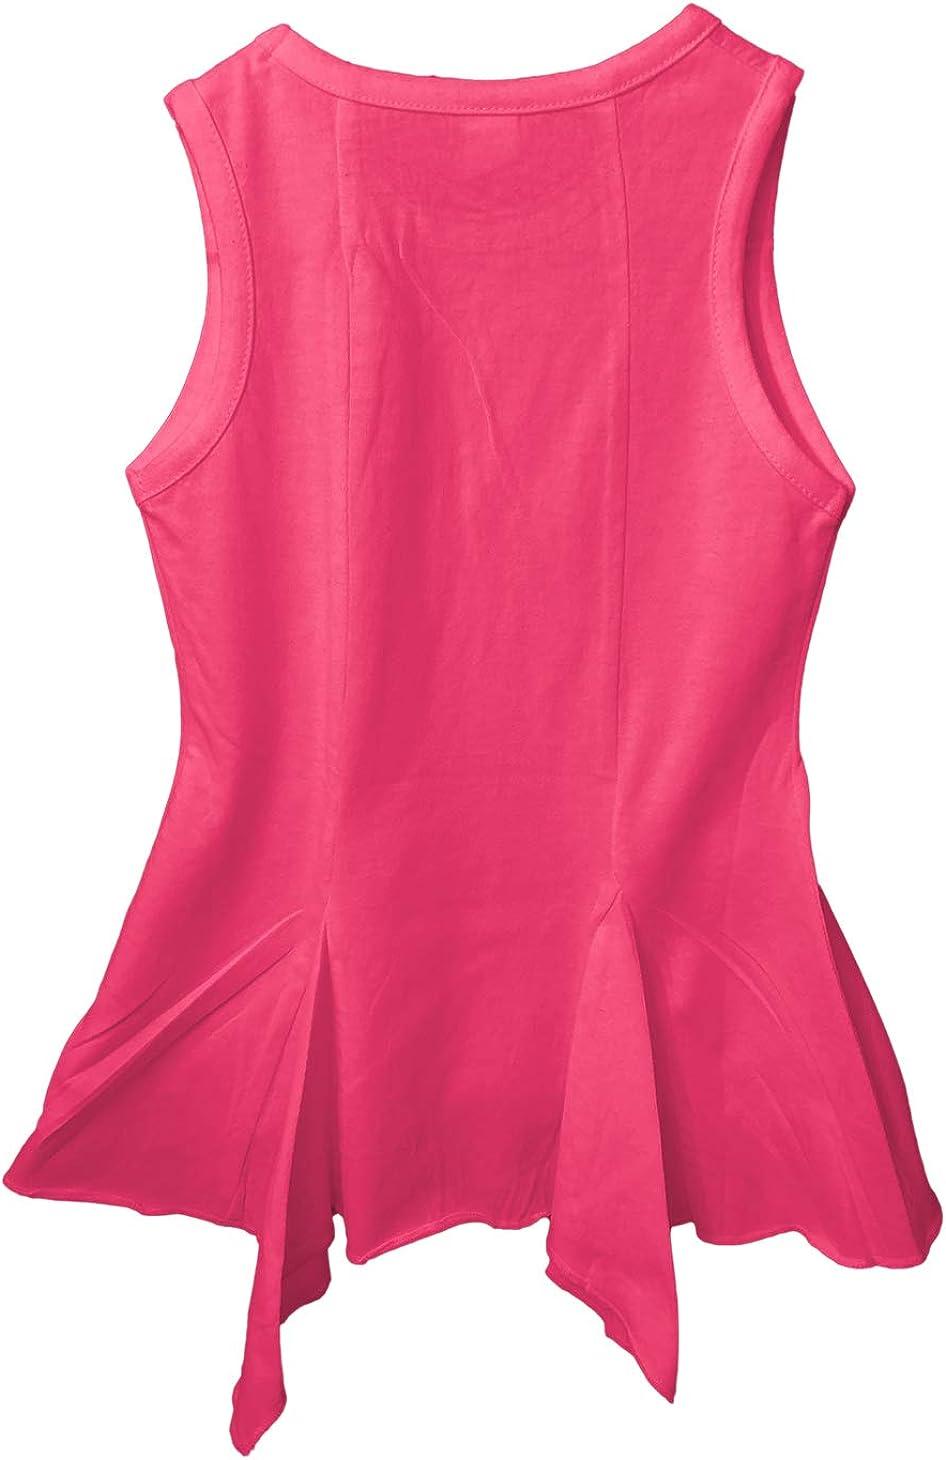 Tcombo for My Grandma Breast Cancer Ribbon Toddler//Youth Sleeveless Backswing